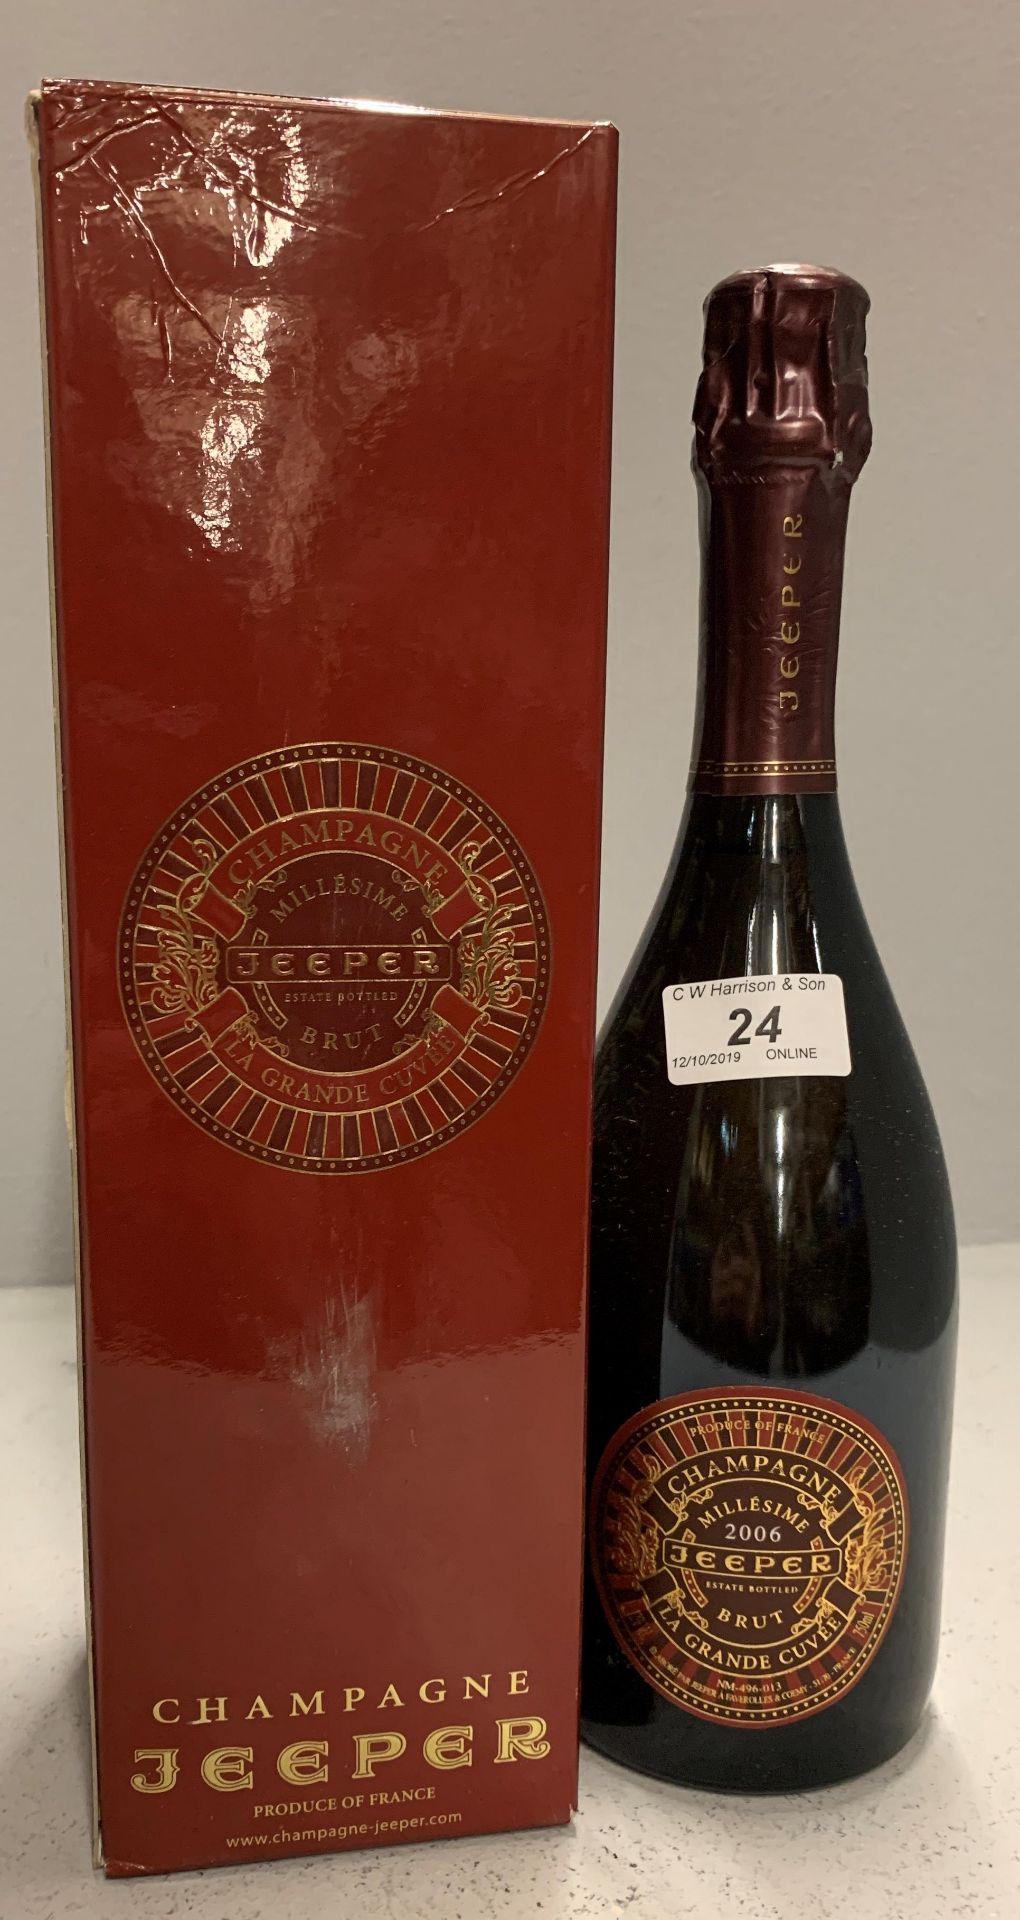 Lot 24 - 750ml bottle Jeeper LaGrande Cuvee Champ